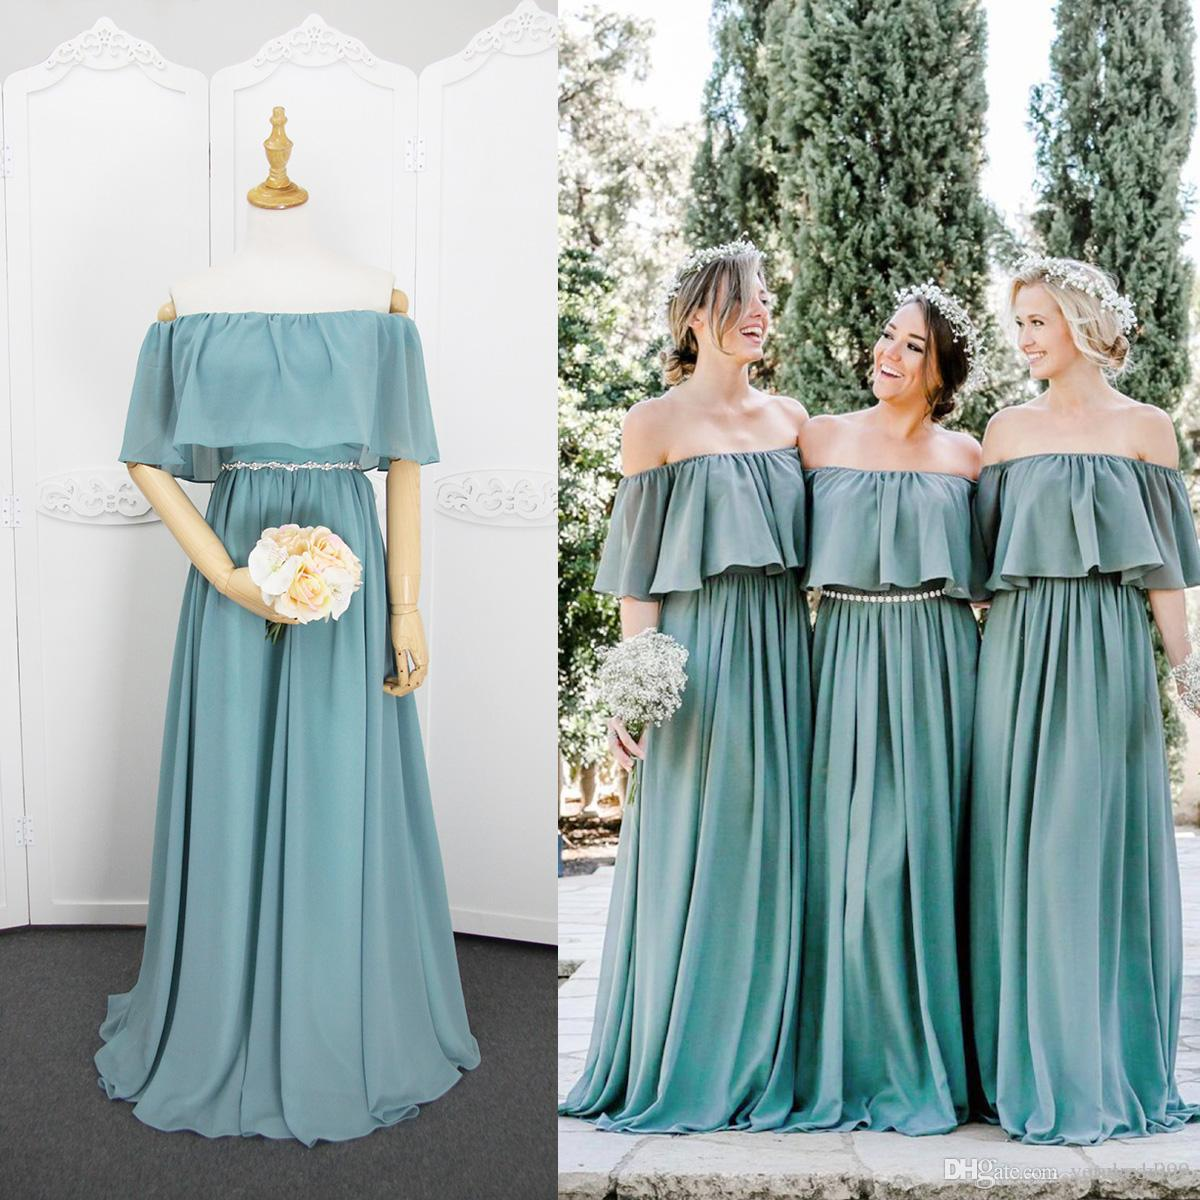 Off Shoulder Chiffon Bridesmaid Dresses Lace Up 2019 Bohemian Bridesmaid Gowns Floor Length Wedding Guest Dresses